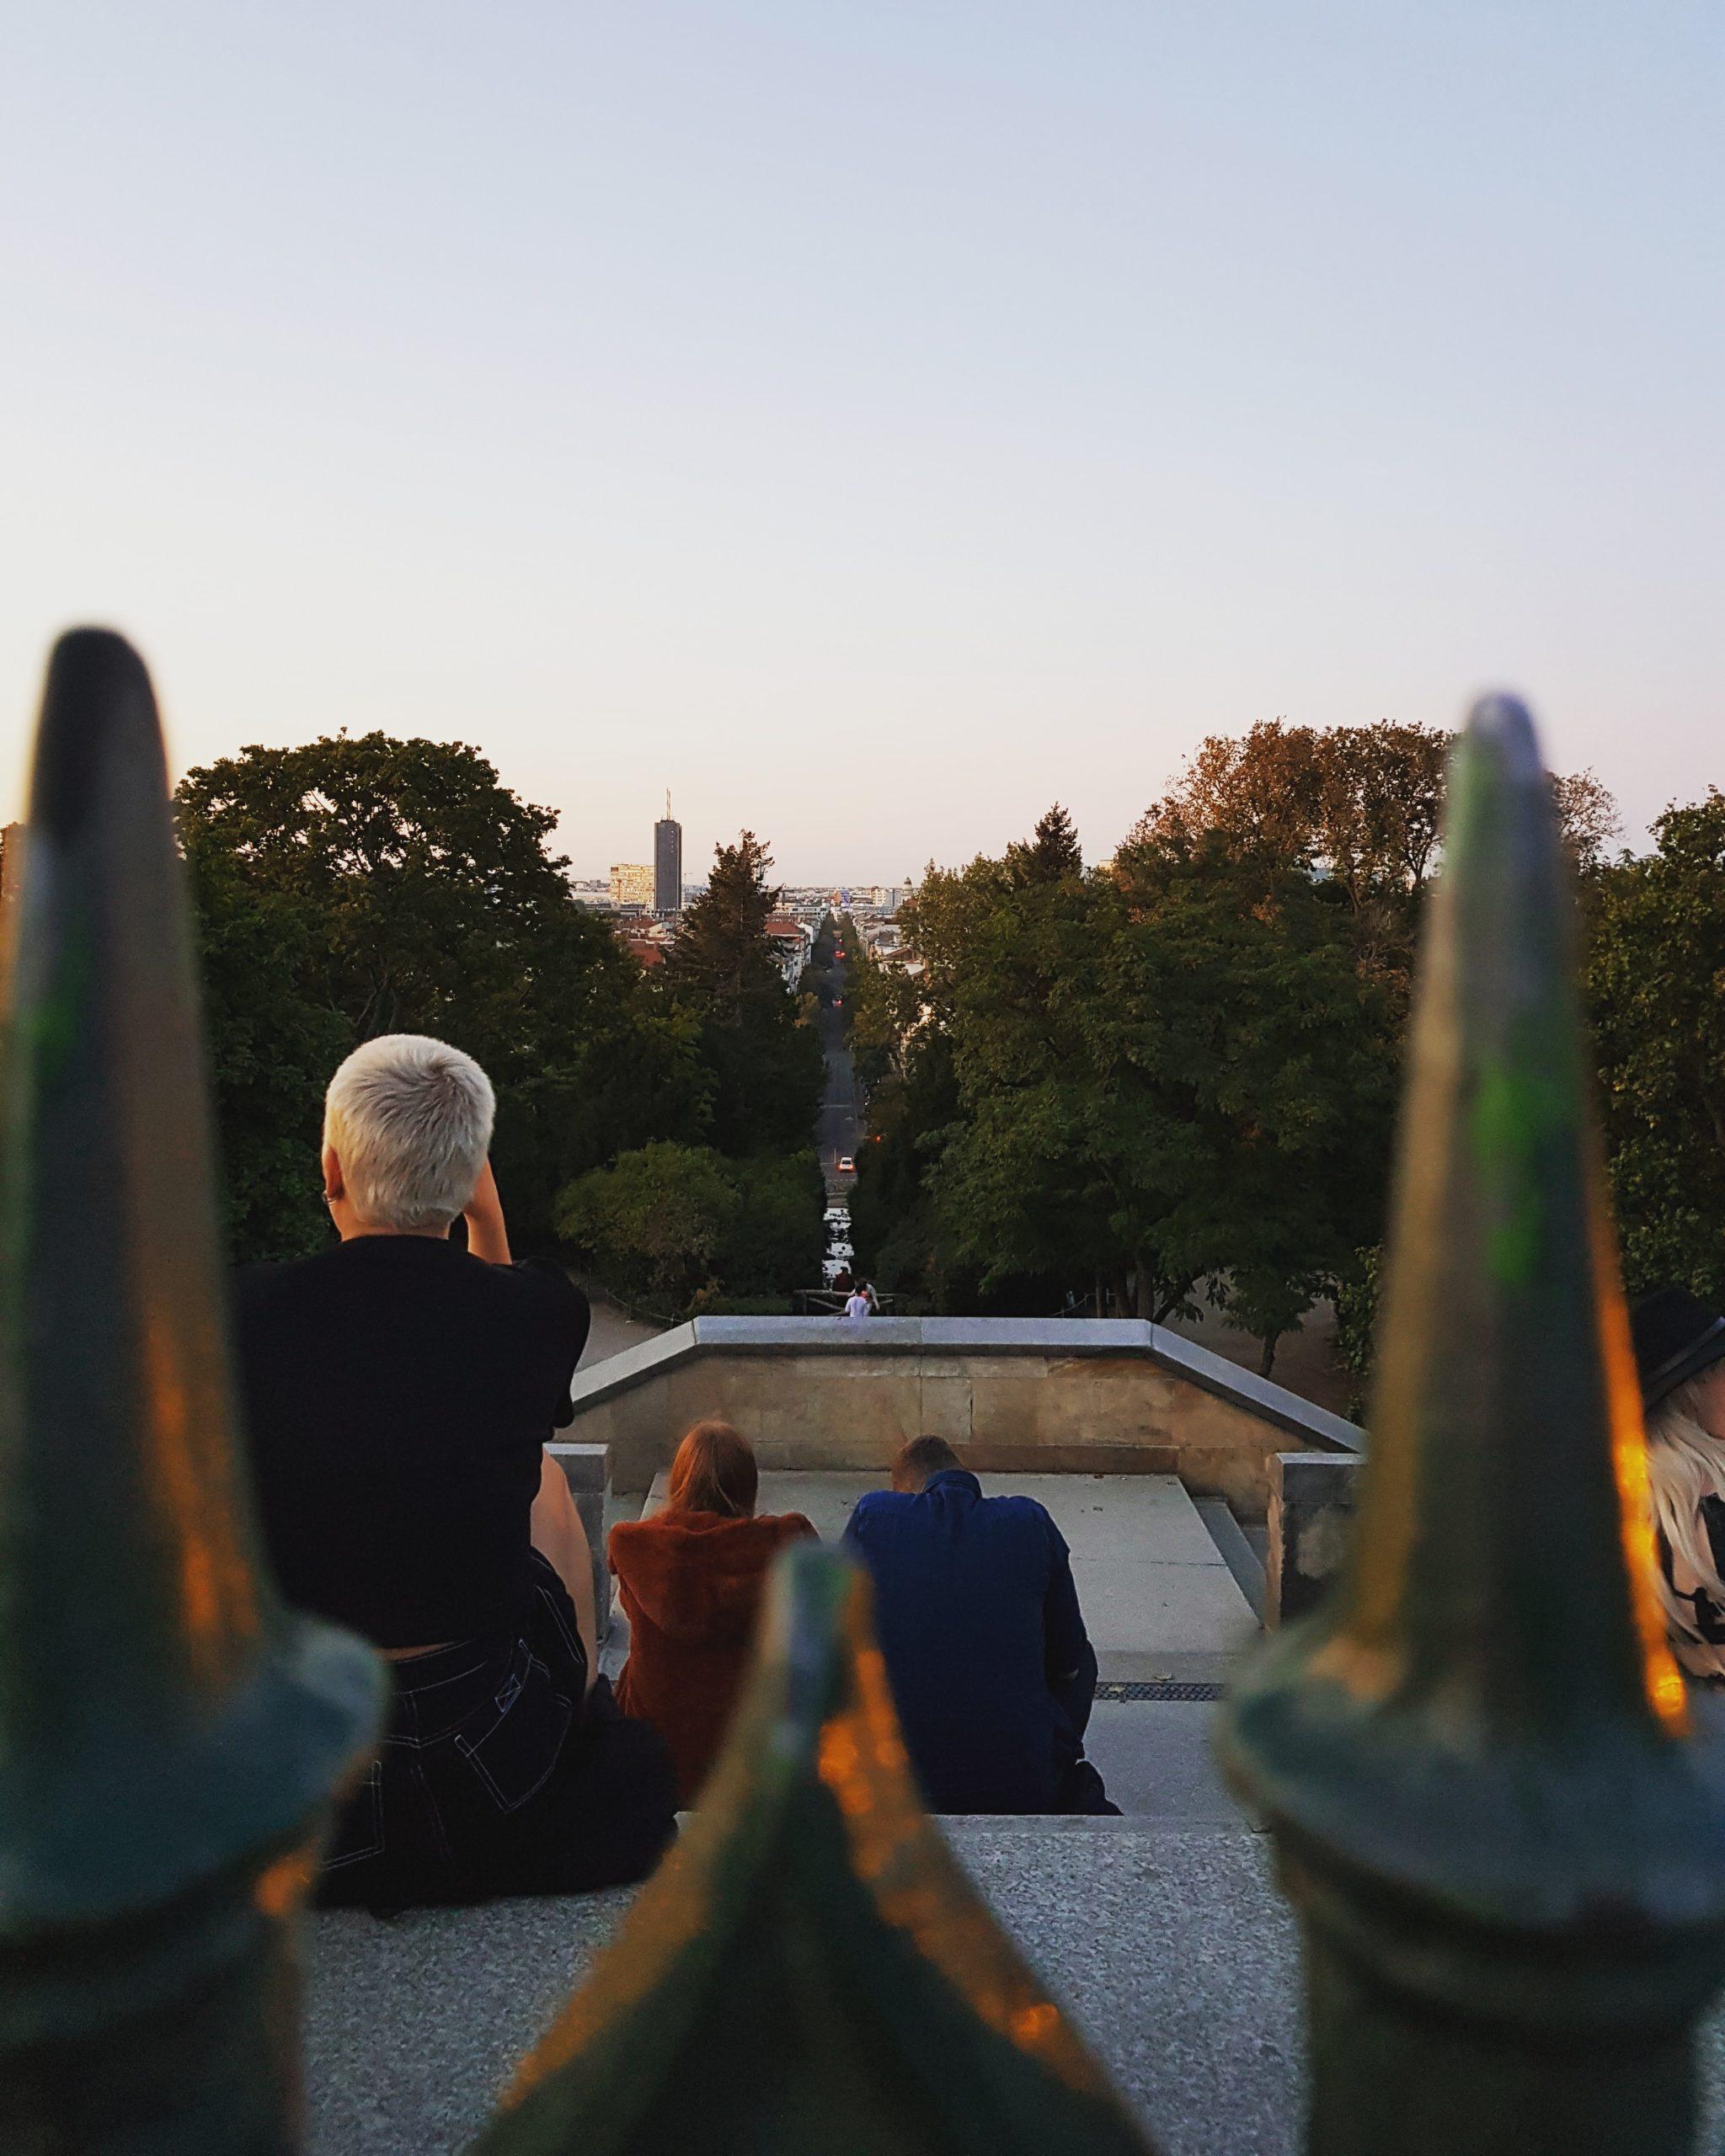 Kreuzberg - things to do in Berlin